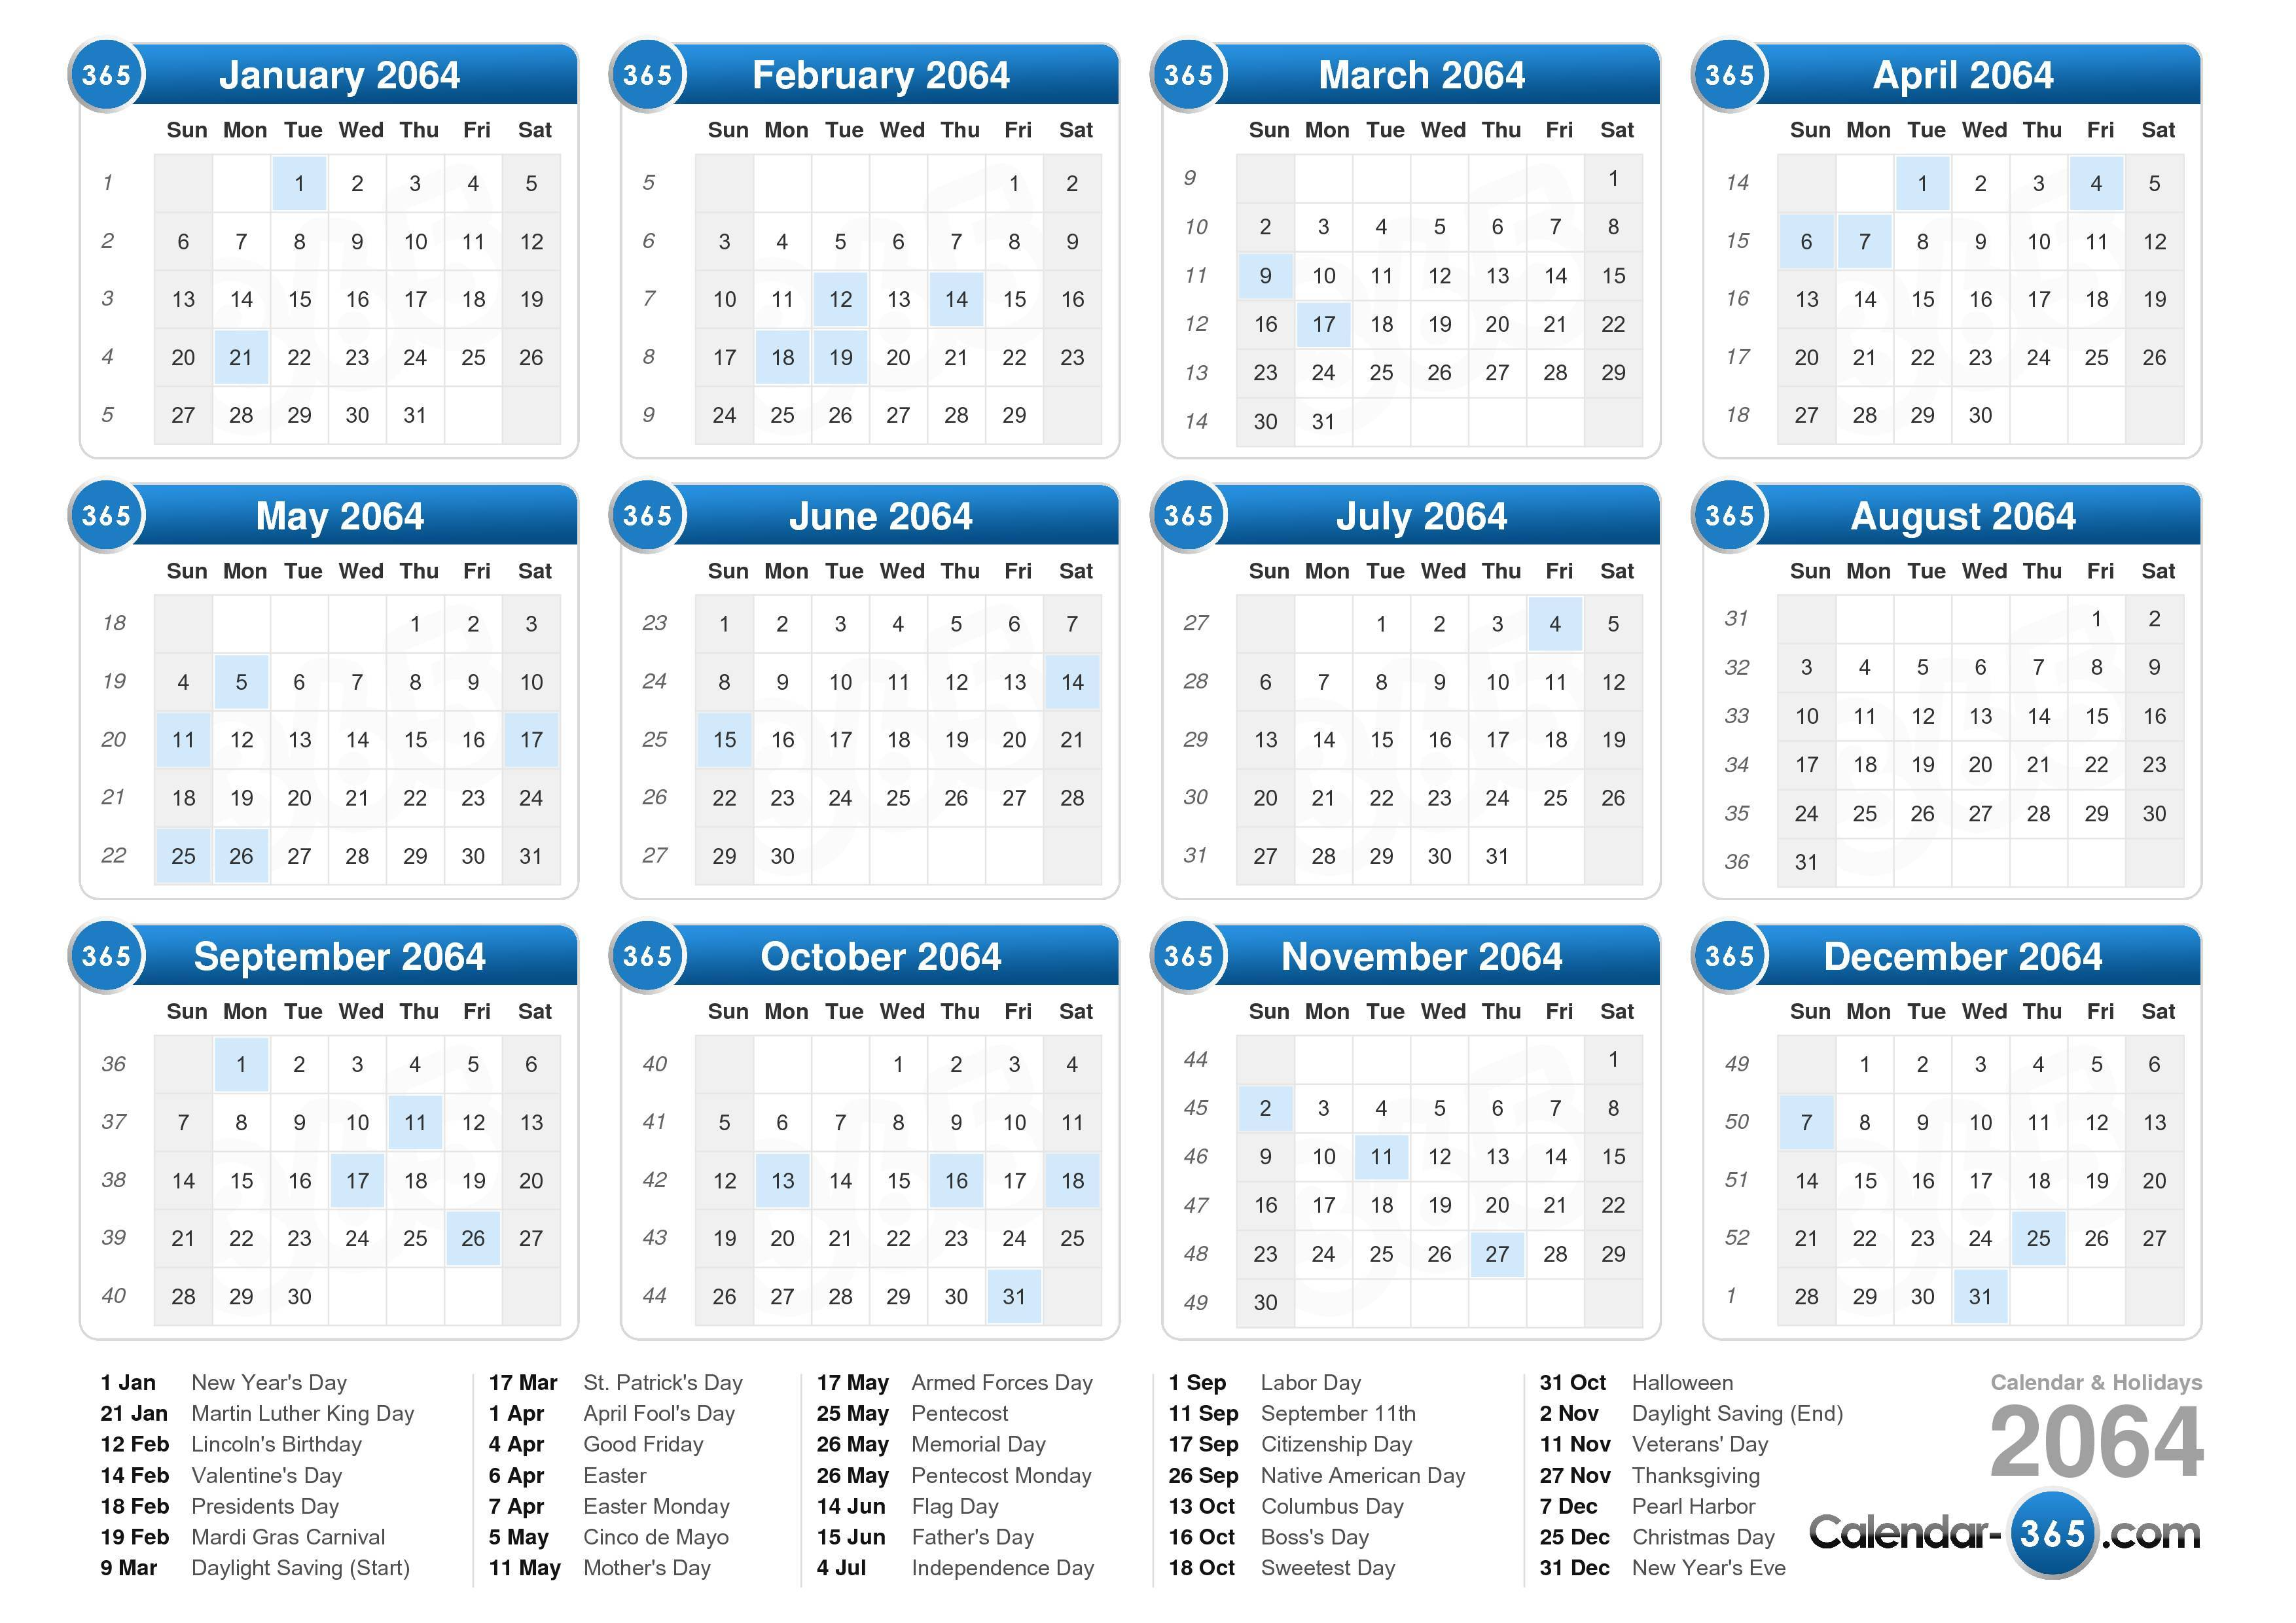 ... calendar with holidays landscape format 1 page 2064 calendar 177 393